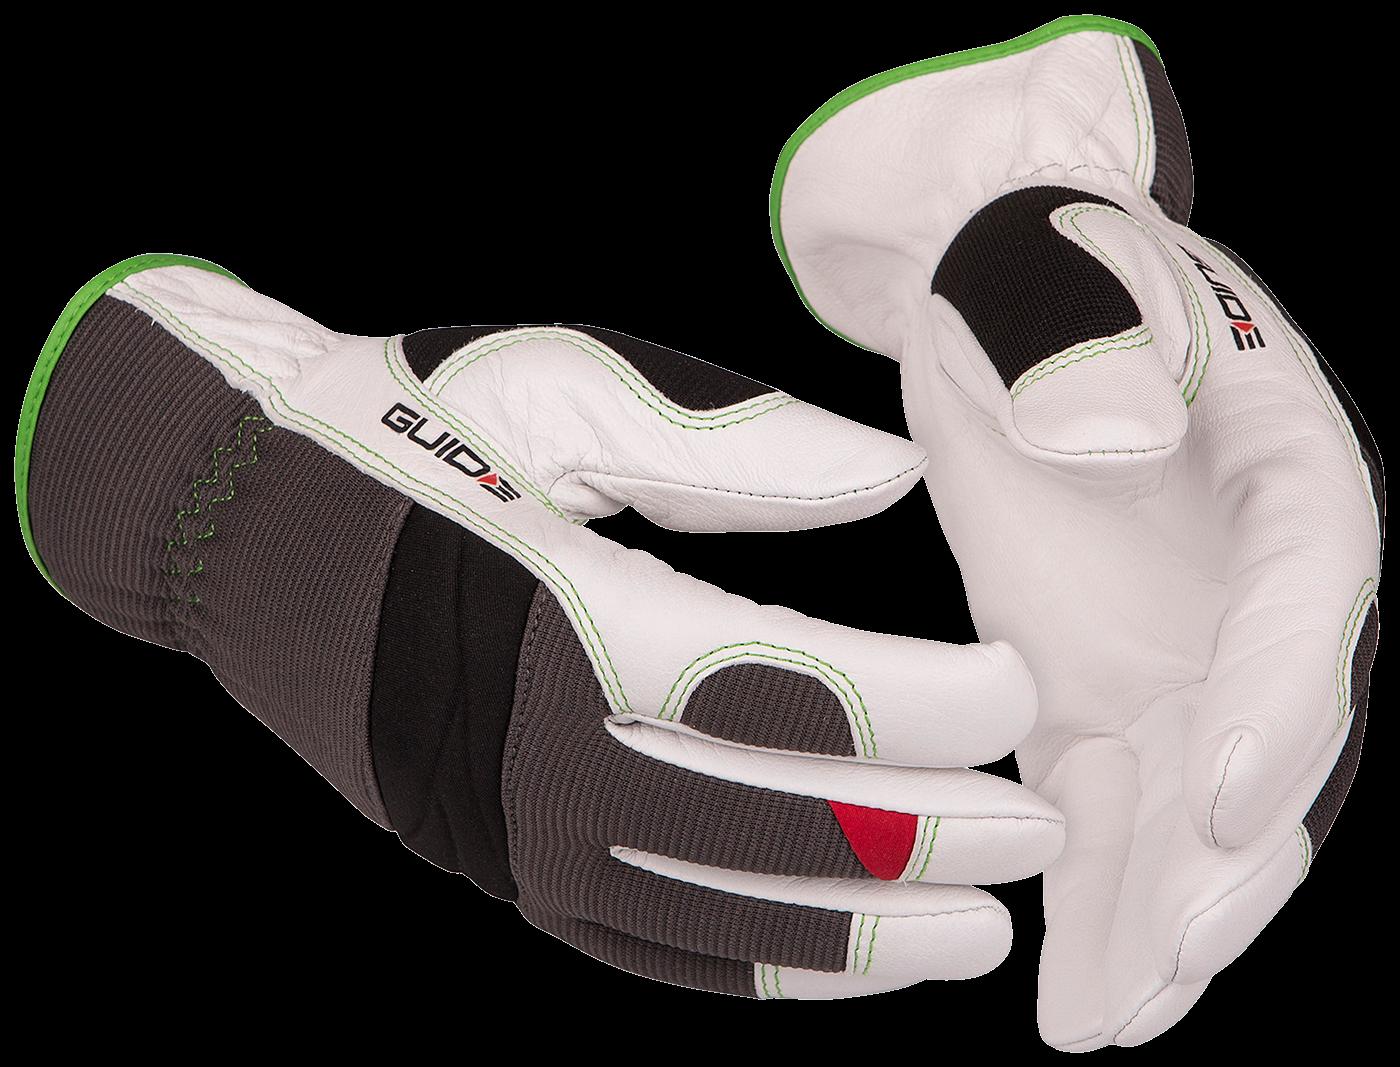 Heavyweight working glove GUIDE 46